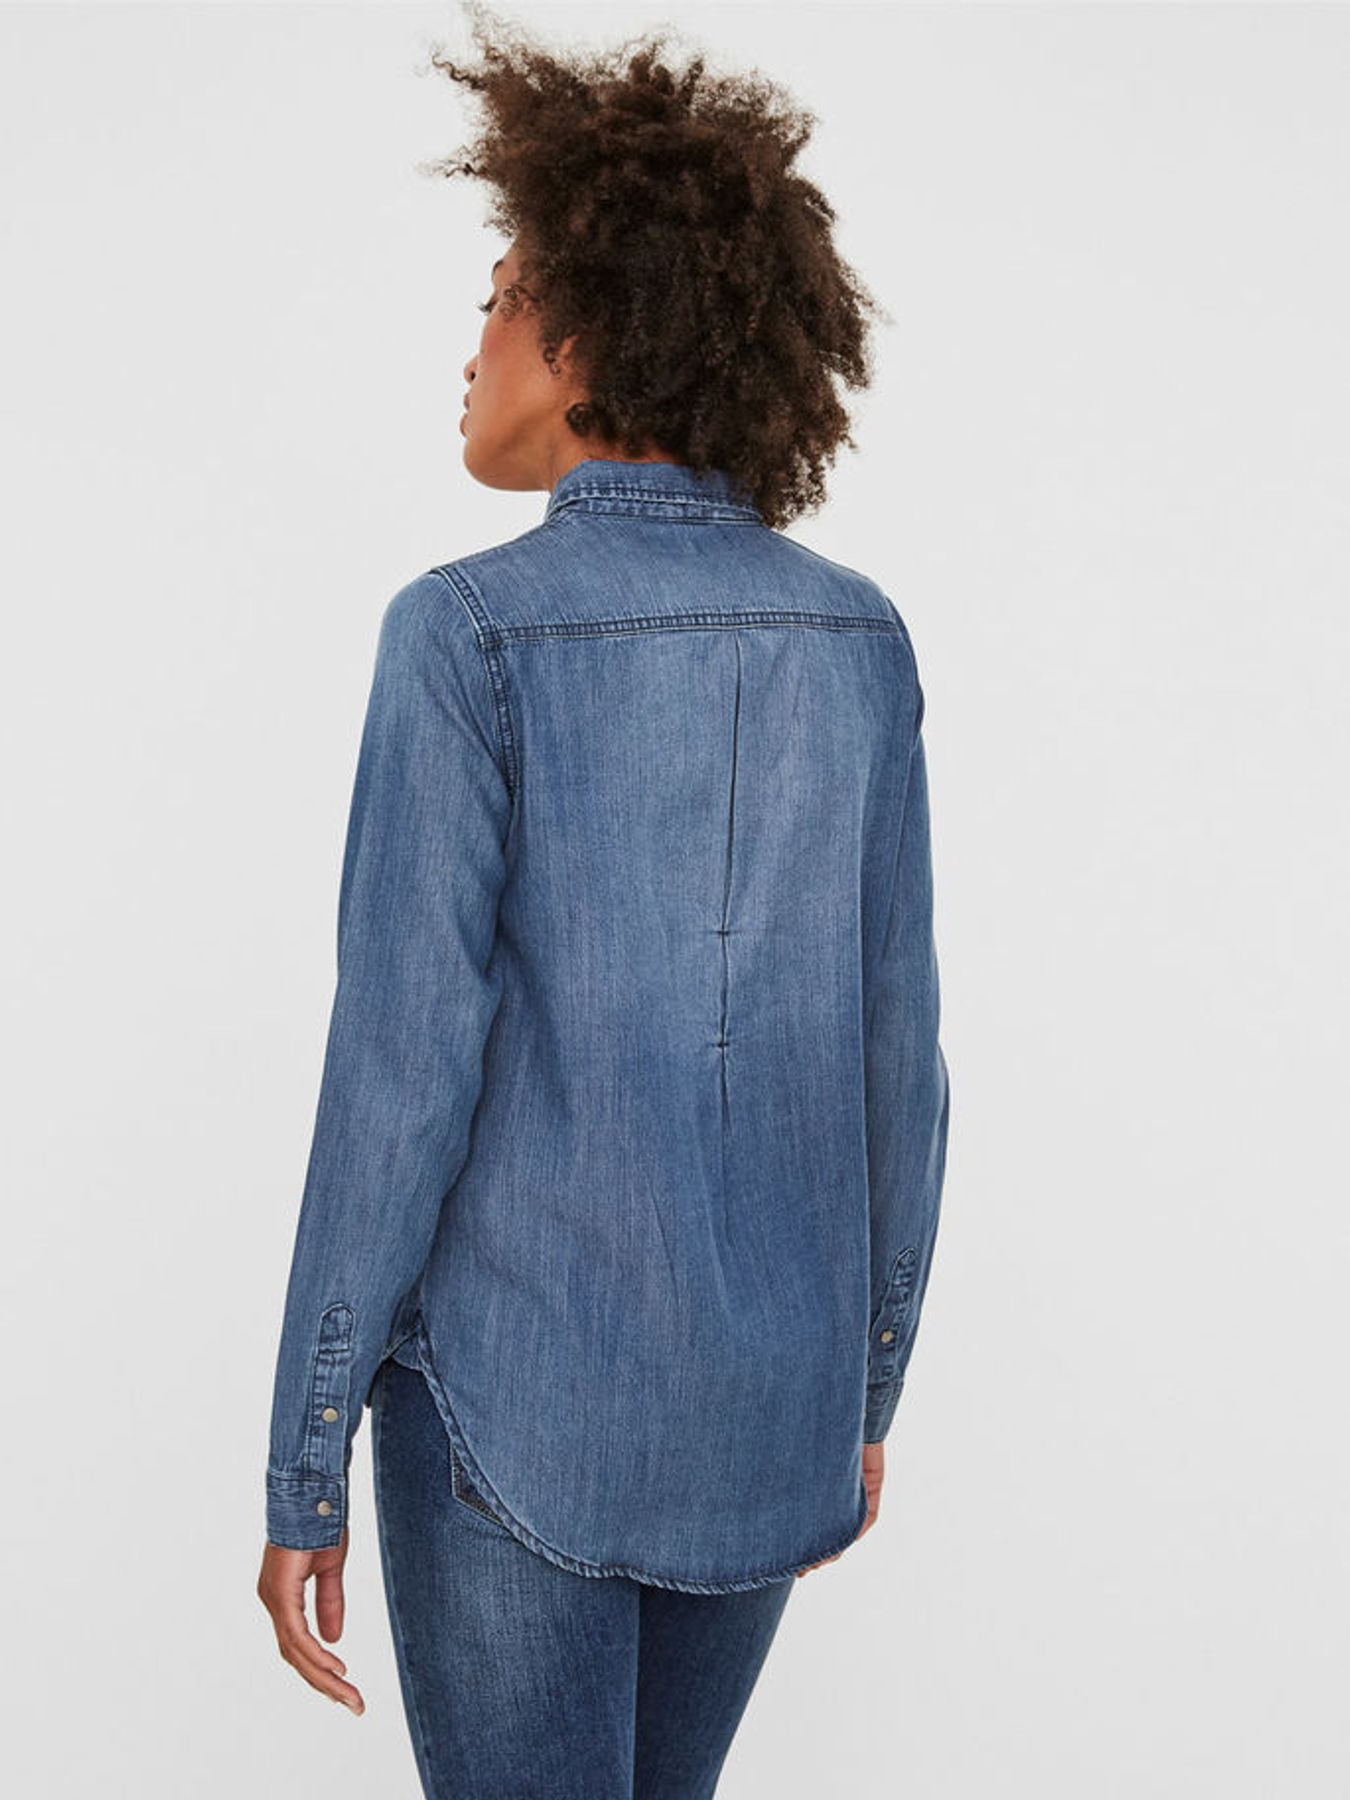 Vero Moda - Damen Jeans Bluse in Hellblau, VMSAMMI (10188573) – Bild 3 aa875ec221